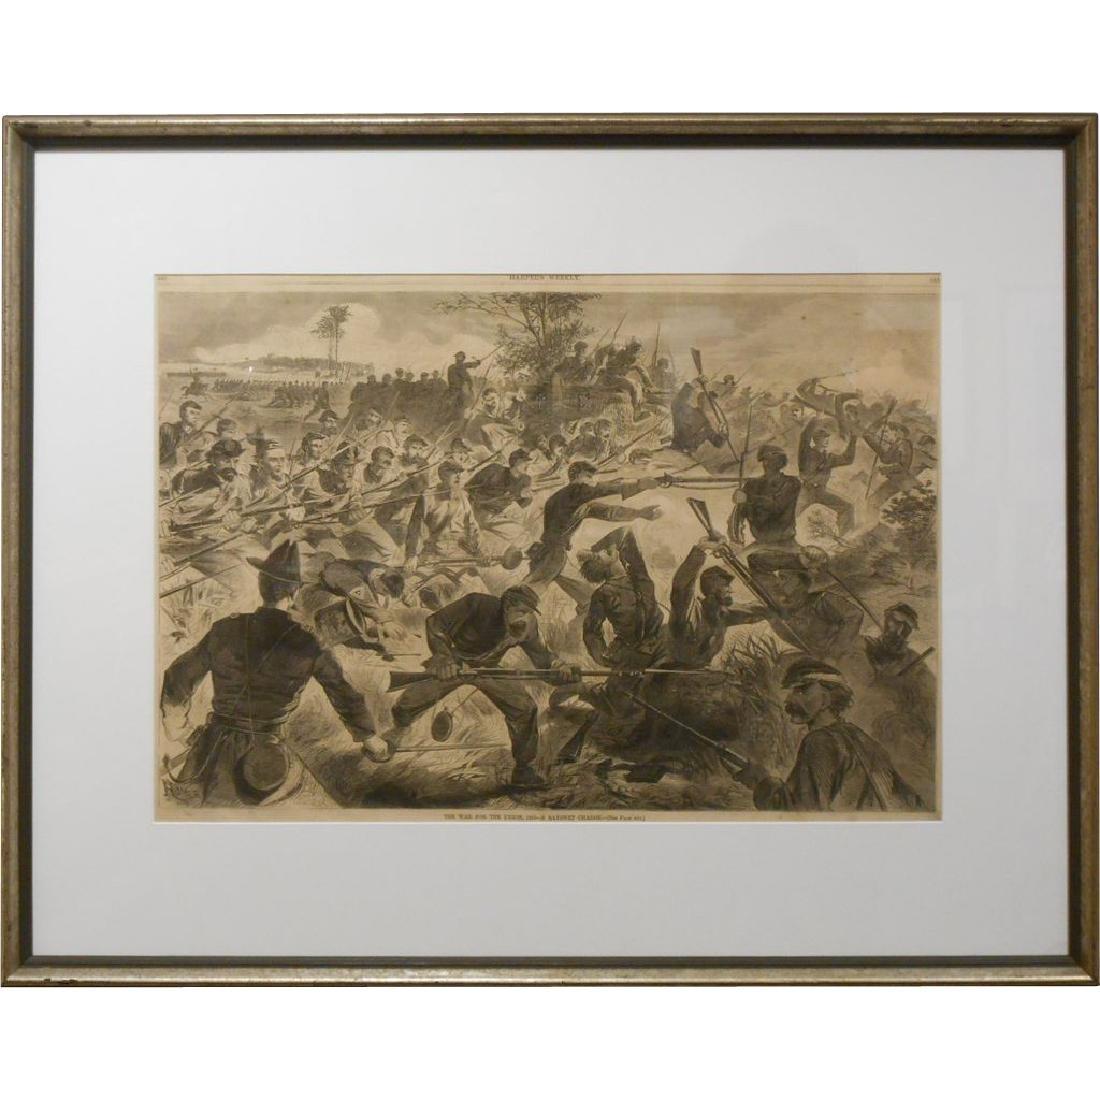 Winslow Homer Civil War Engraving Bayonet Charge 1862